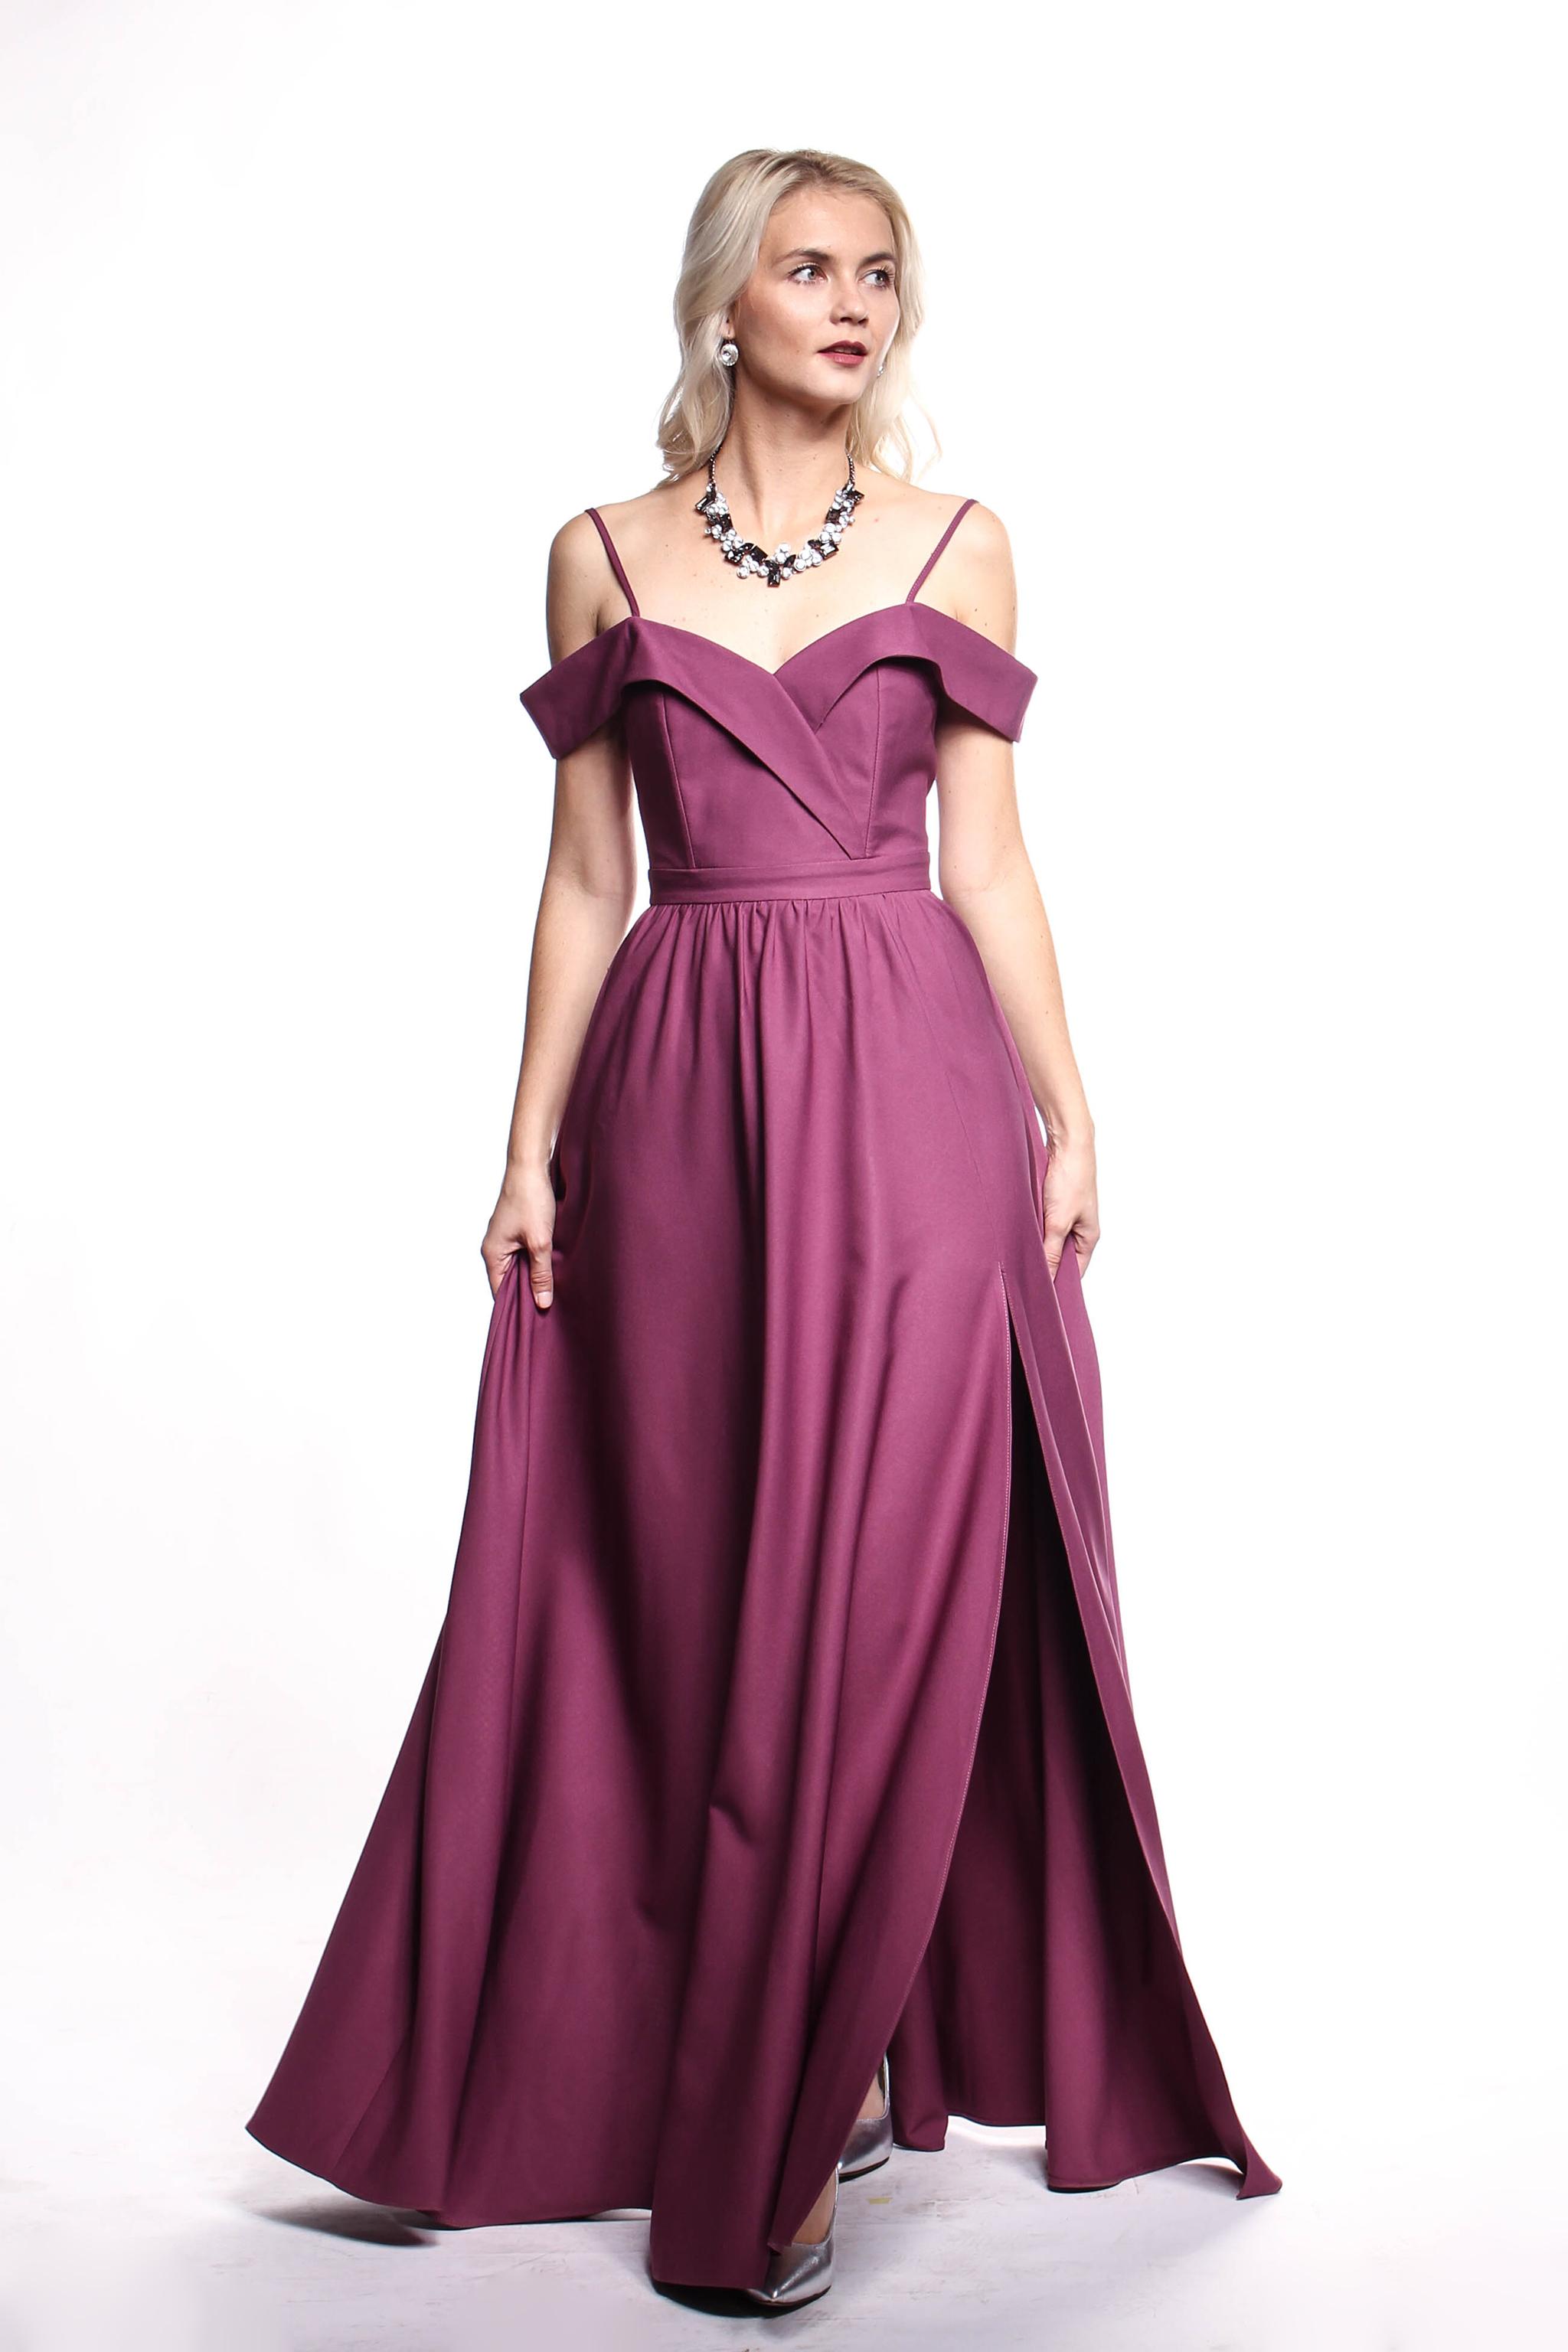 4439d682188c Obrázok 5 Fialové plesové šaty